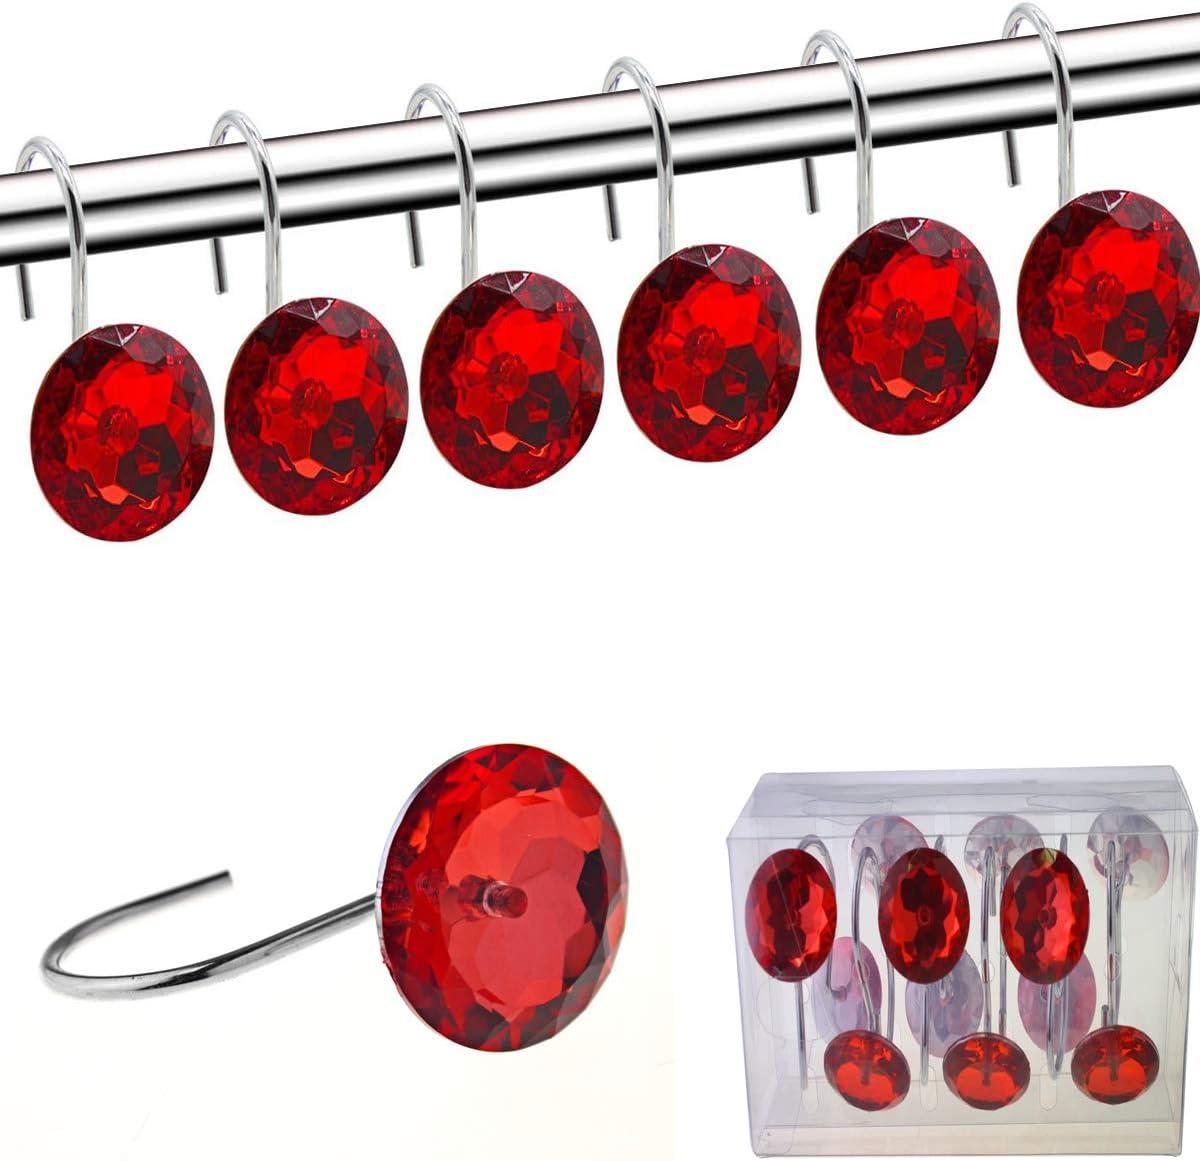 YUYIKES Shower Curtain Hooks Sales Diamond Max 86% OFF Ac Shape Rings Round